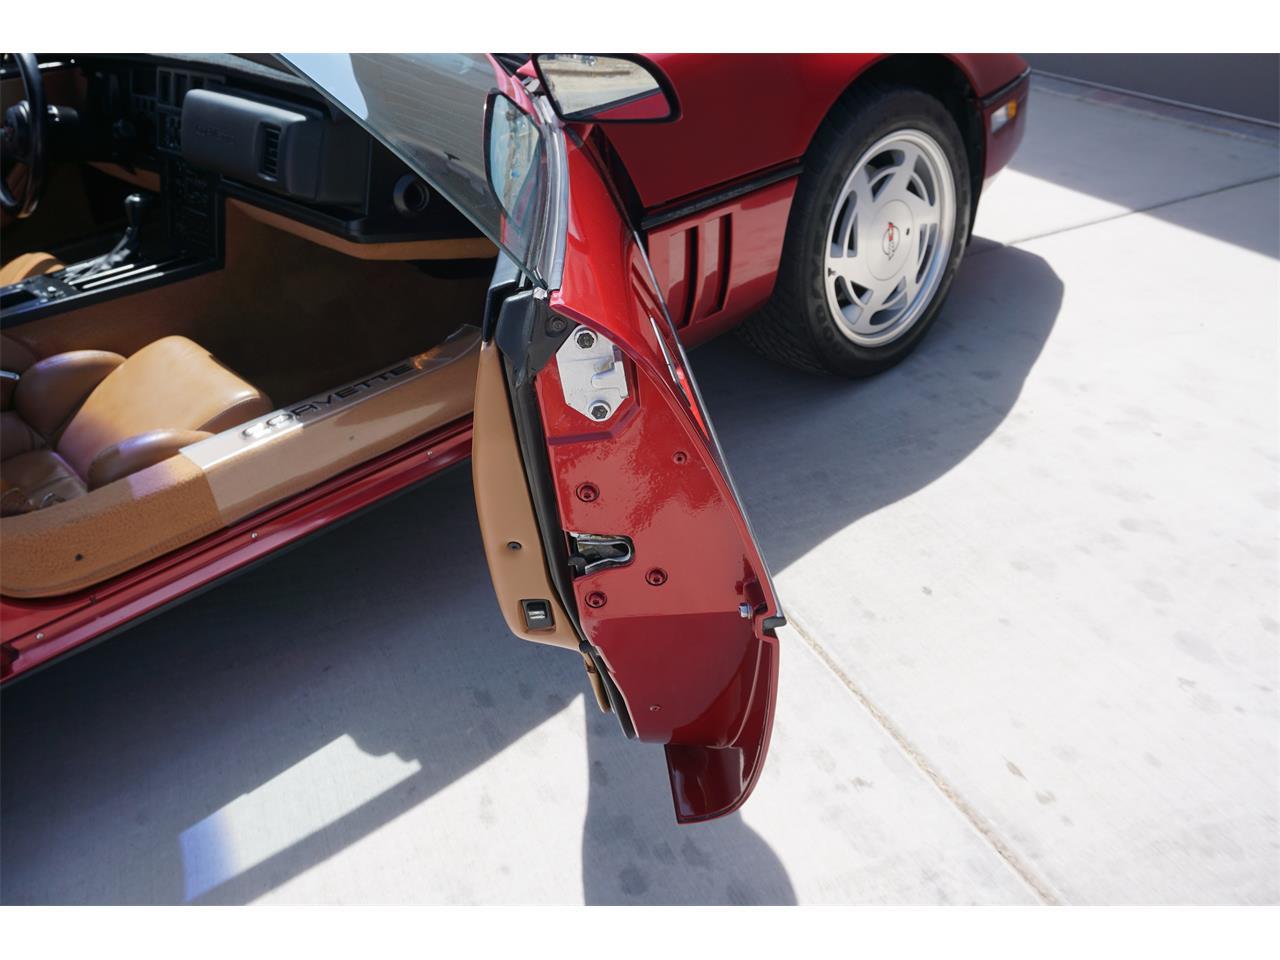 Large Picture of 1989 Chevrolet Corvette C4 located in Colorado - QTU6